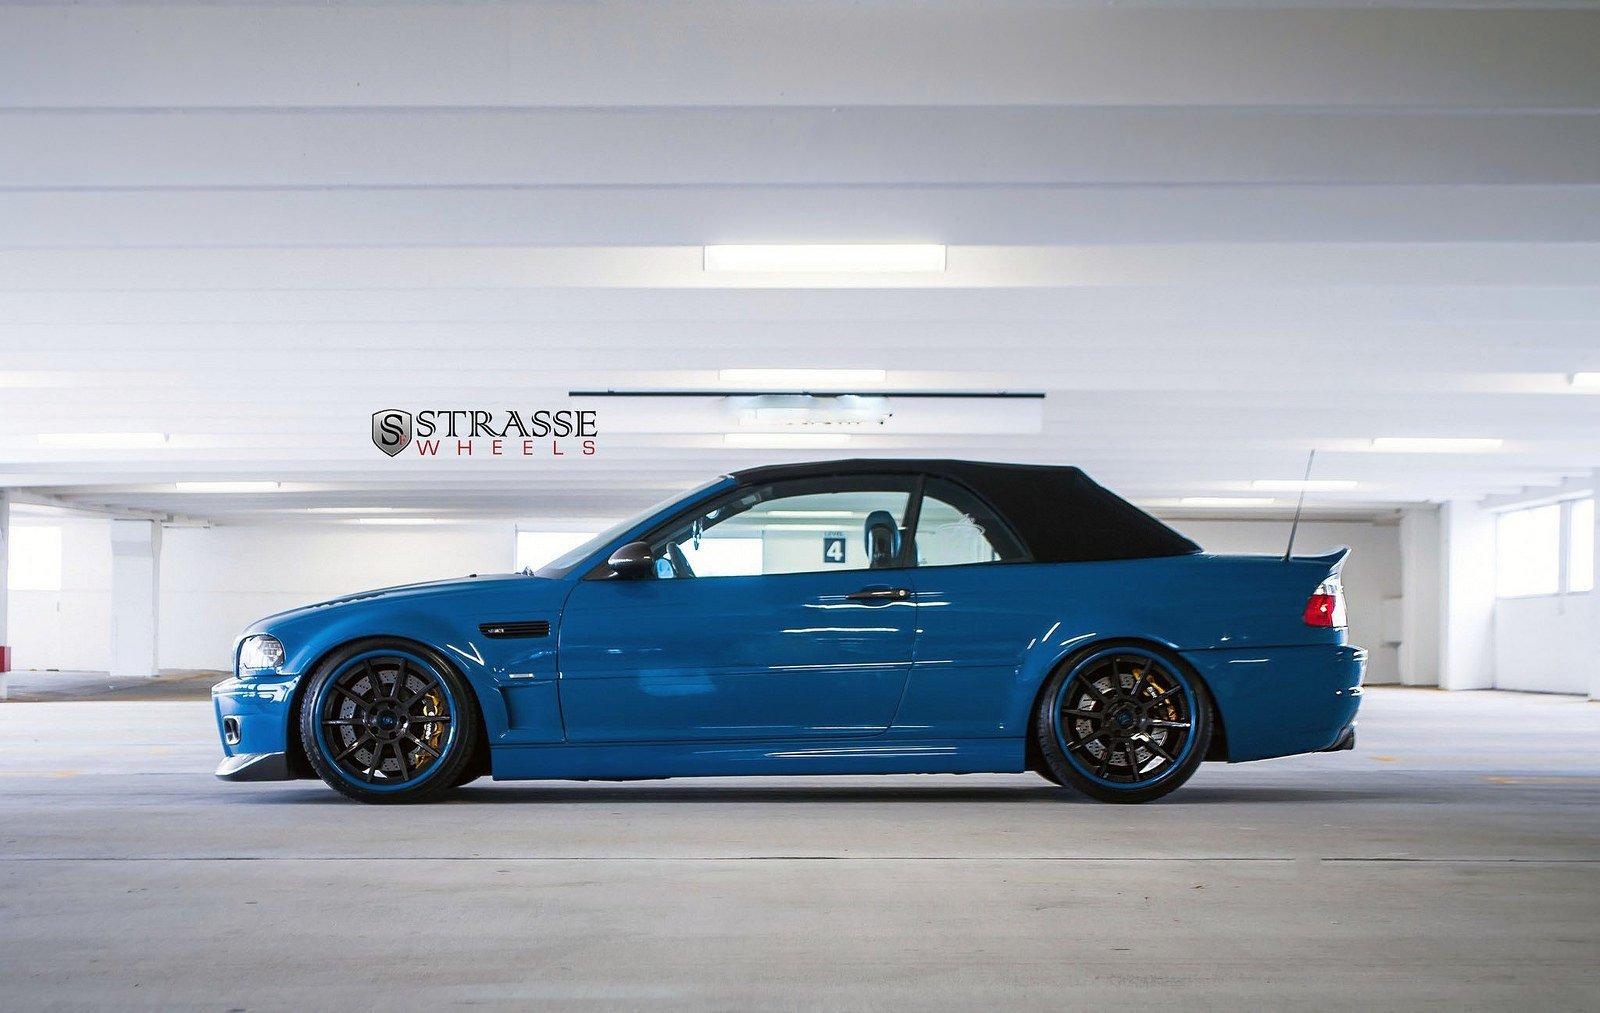 Bmw E46 M3 Convertible Blue Strasse Tuning Wheels Wallpaper 1600x1013 390364 Wallpaperup